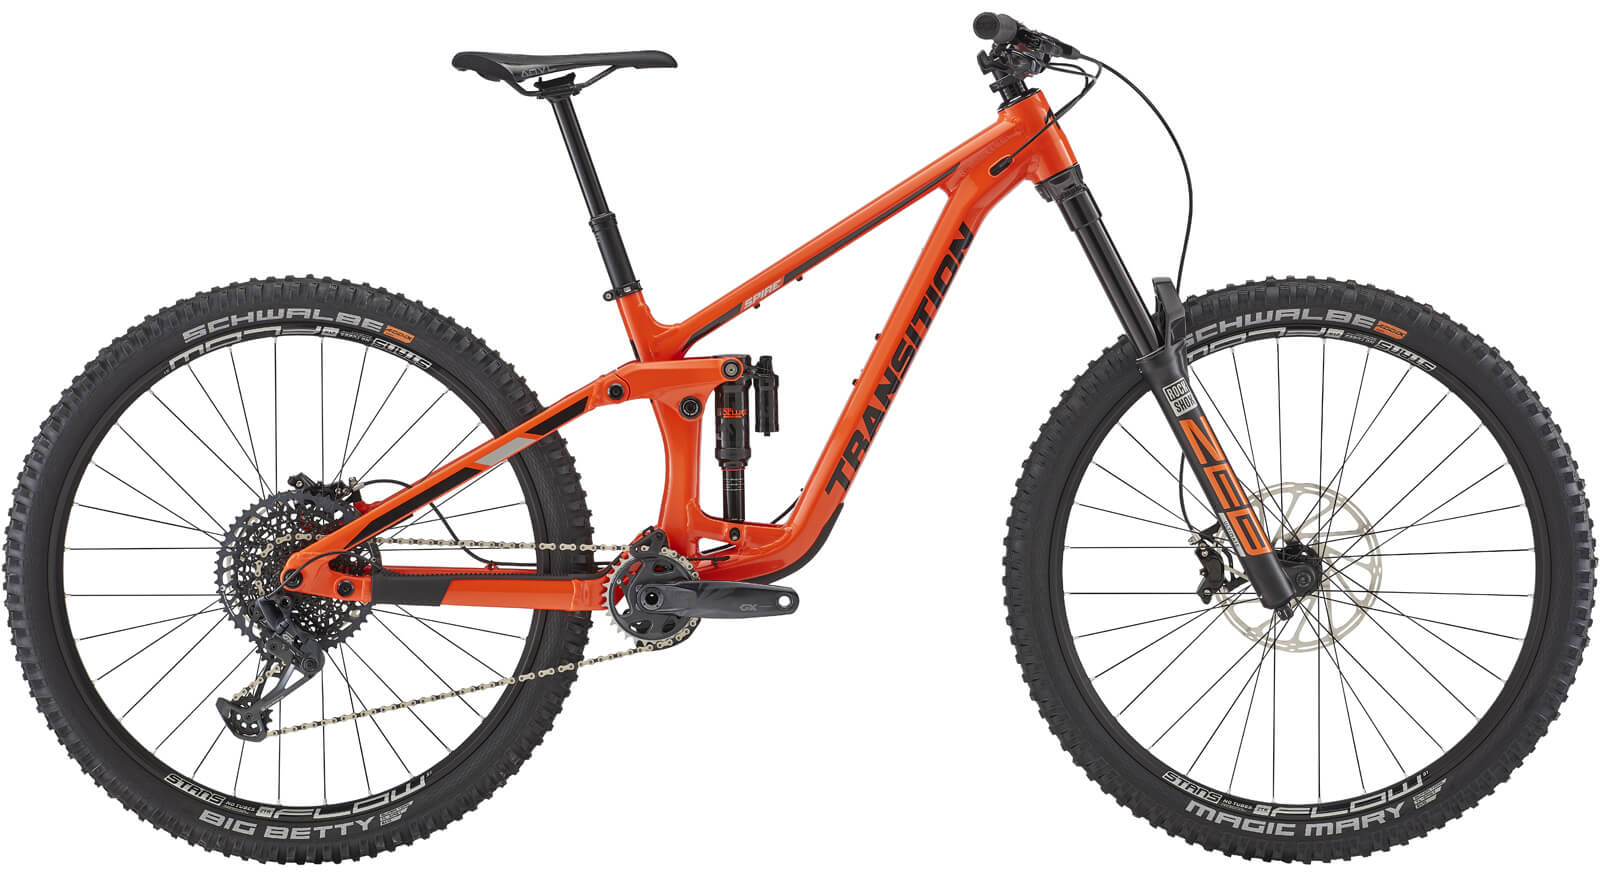 Image of Transition Spire Alloy GX 29er Mountain Bike 2021 Factory Orange